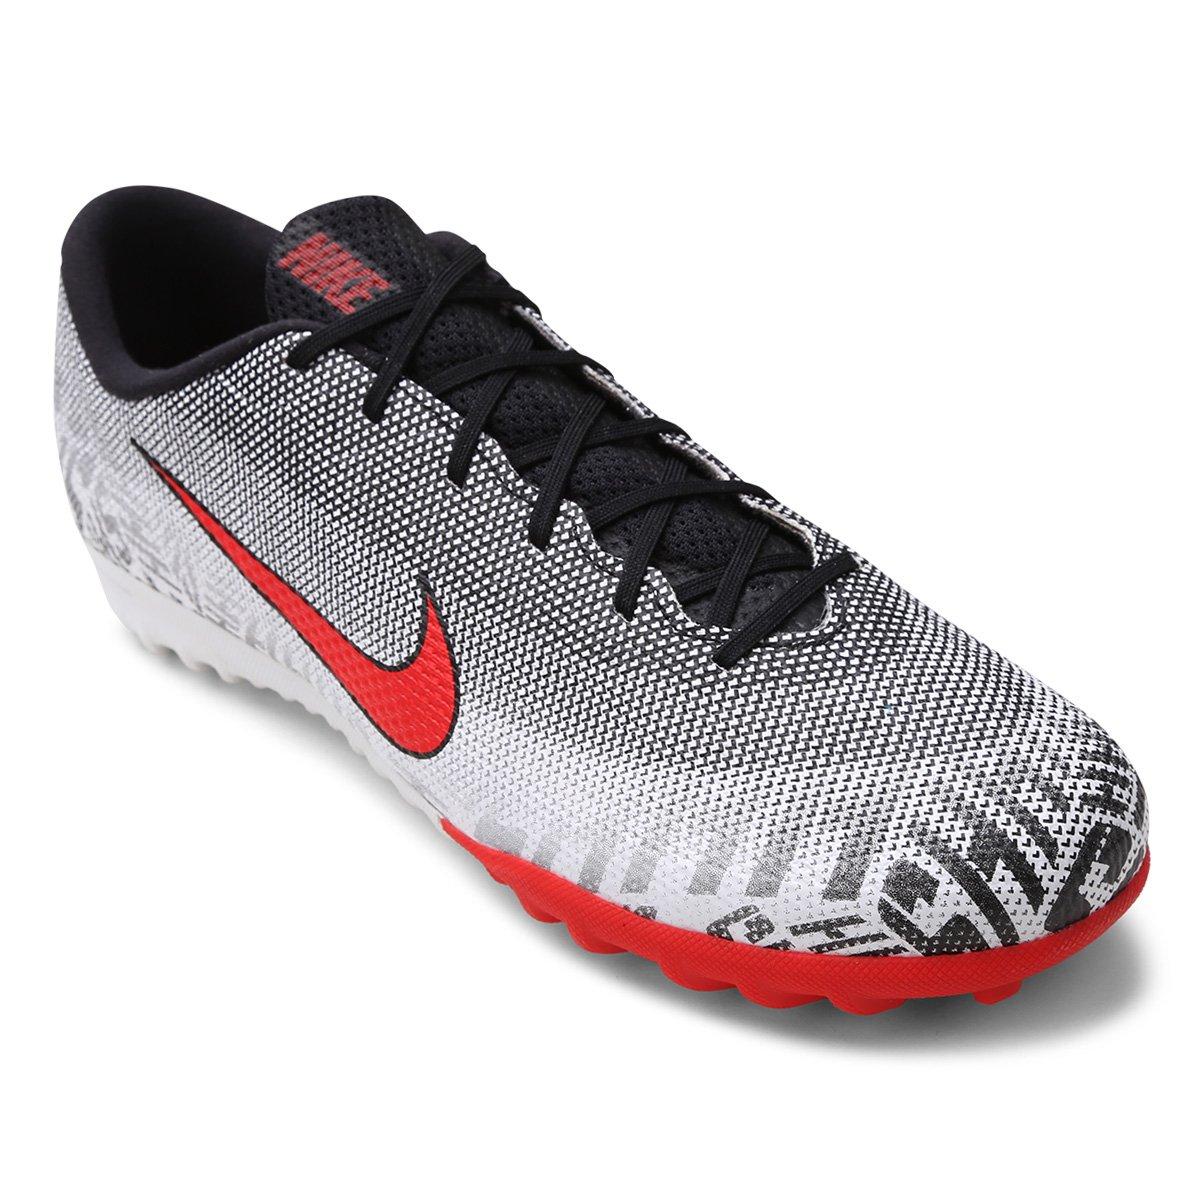 fdc42395d9 Chuteira Society Nike Mercurial Vapor 12 Academy Neymar Jr TF - Branco e  Vermelho